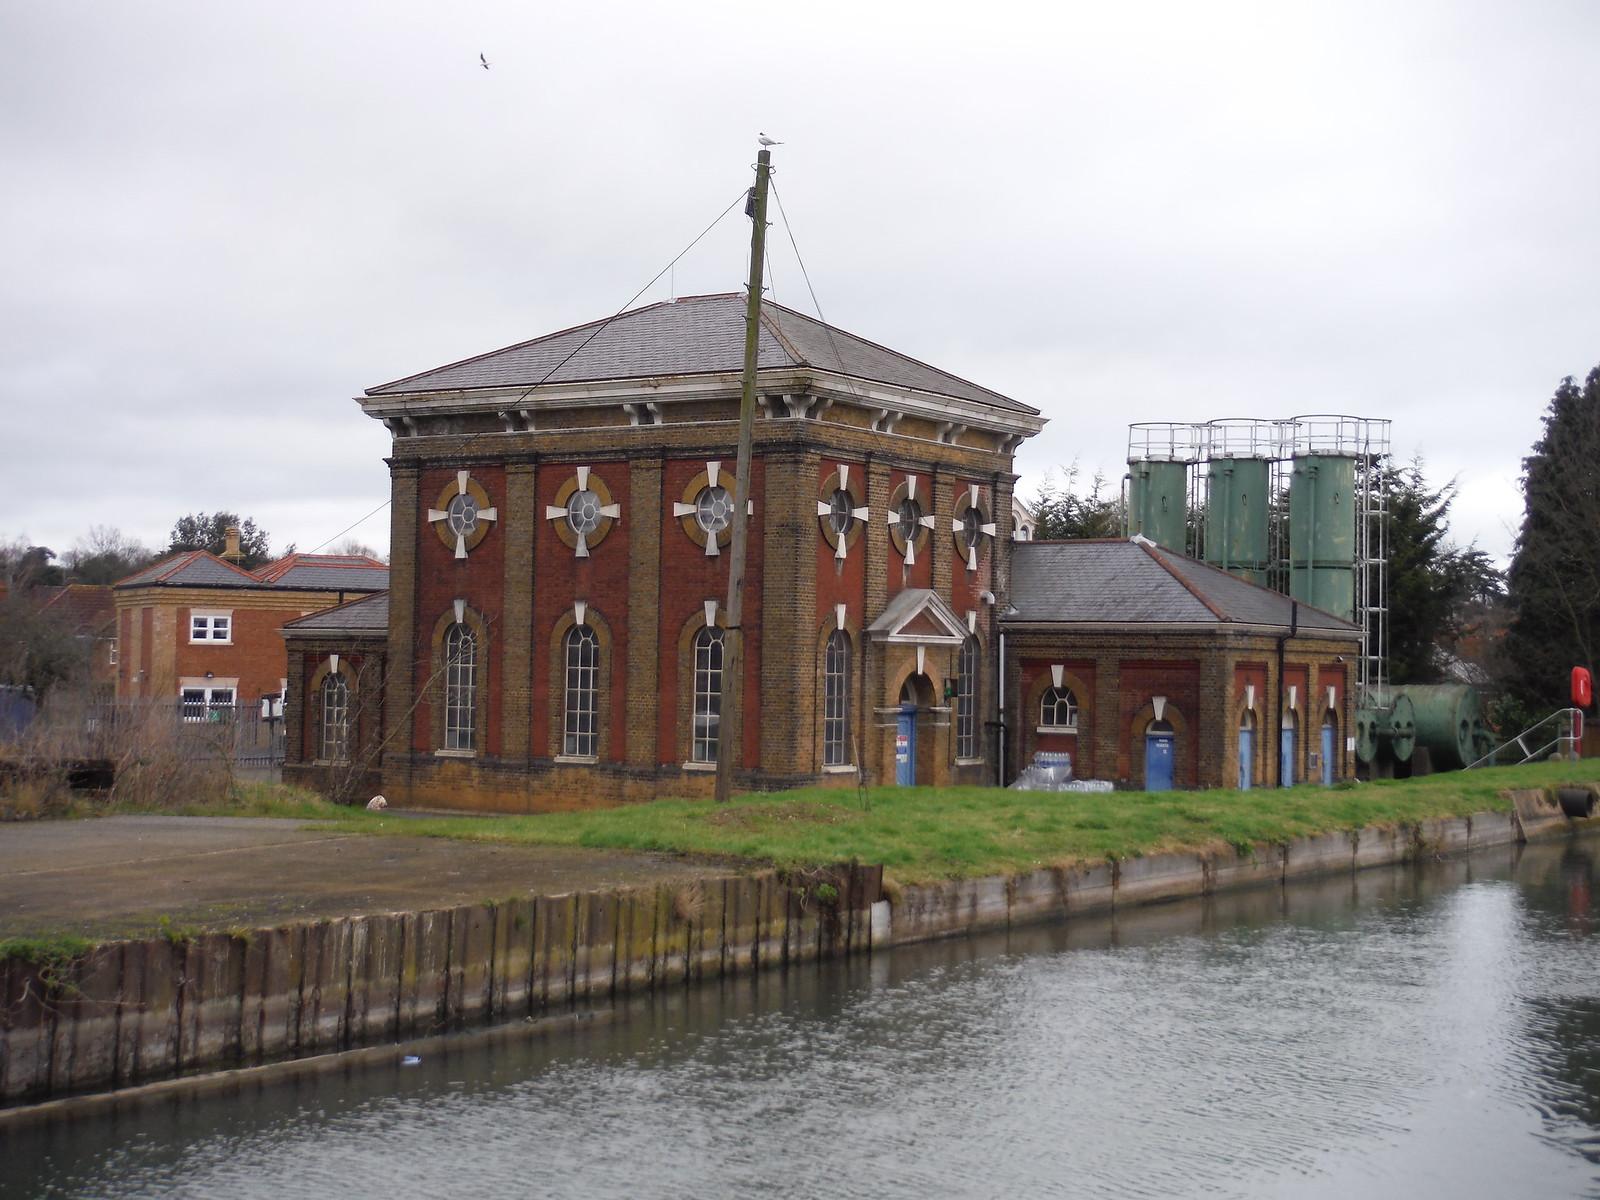 Broxbourne Pumping Station on The New River SWC Walk 168 Broxbourne Circular